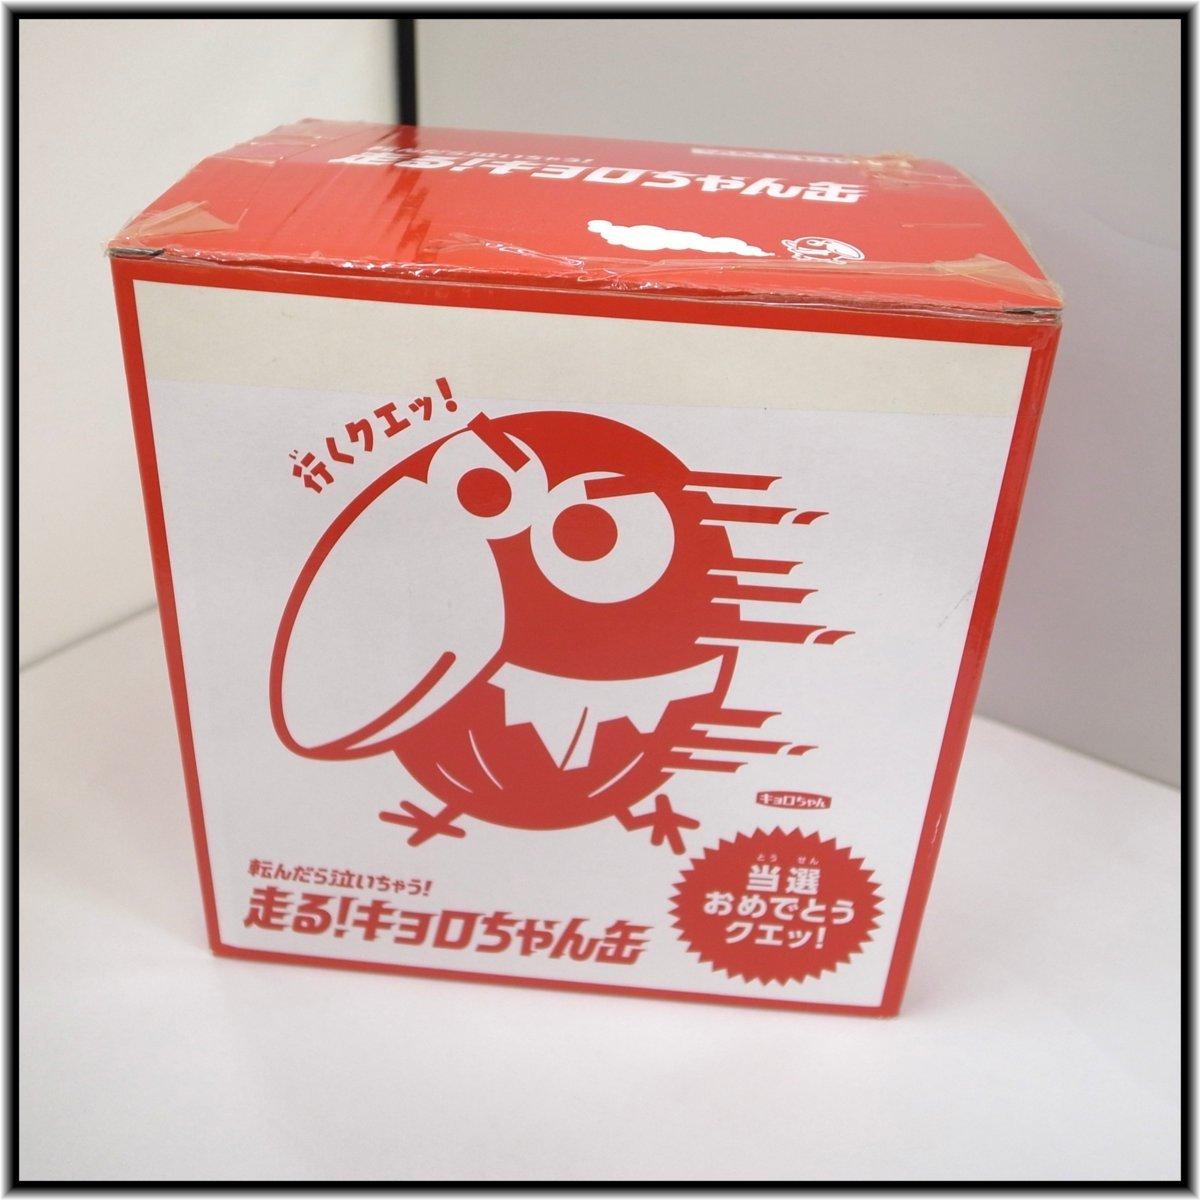 6362T【本物保証】未開封 走る キョロちゃん缶 金のエンゼル 銀のエンゼル おもちゃのカンヅメ 森永チョコボール_画像1